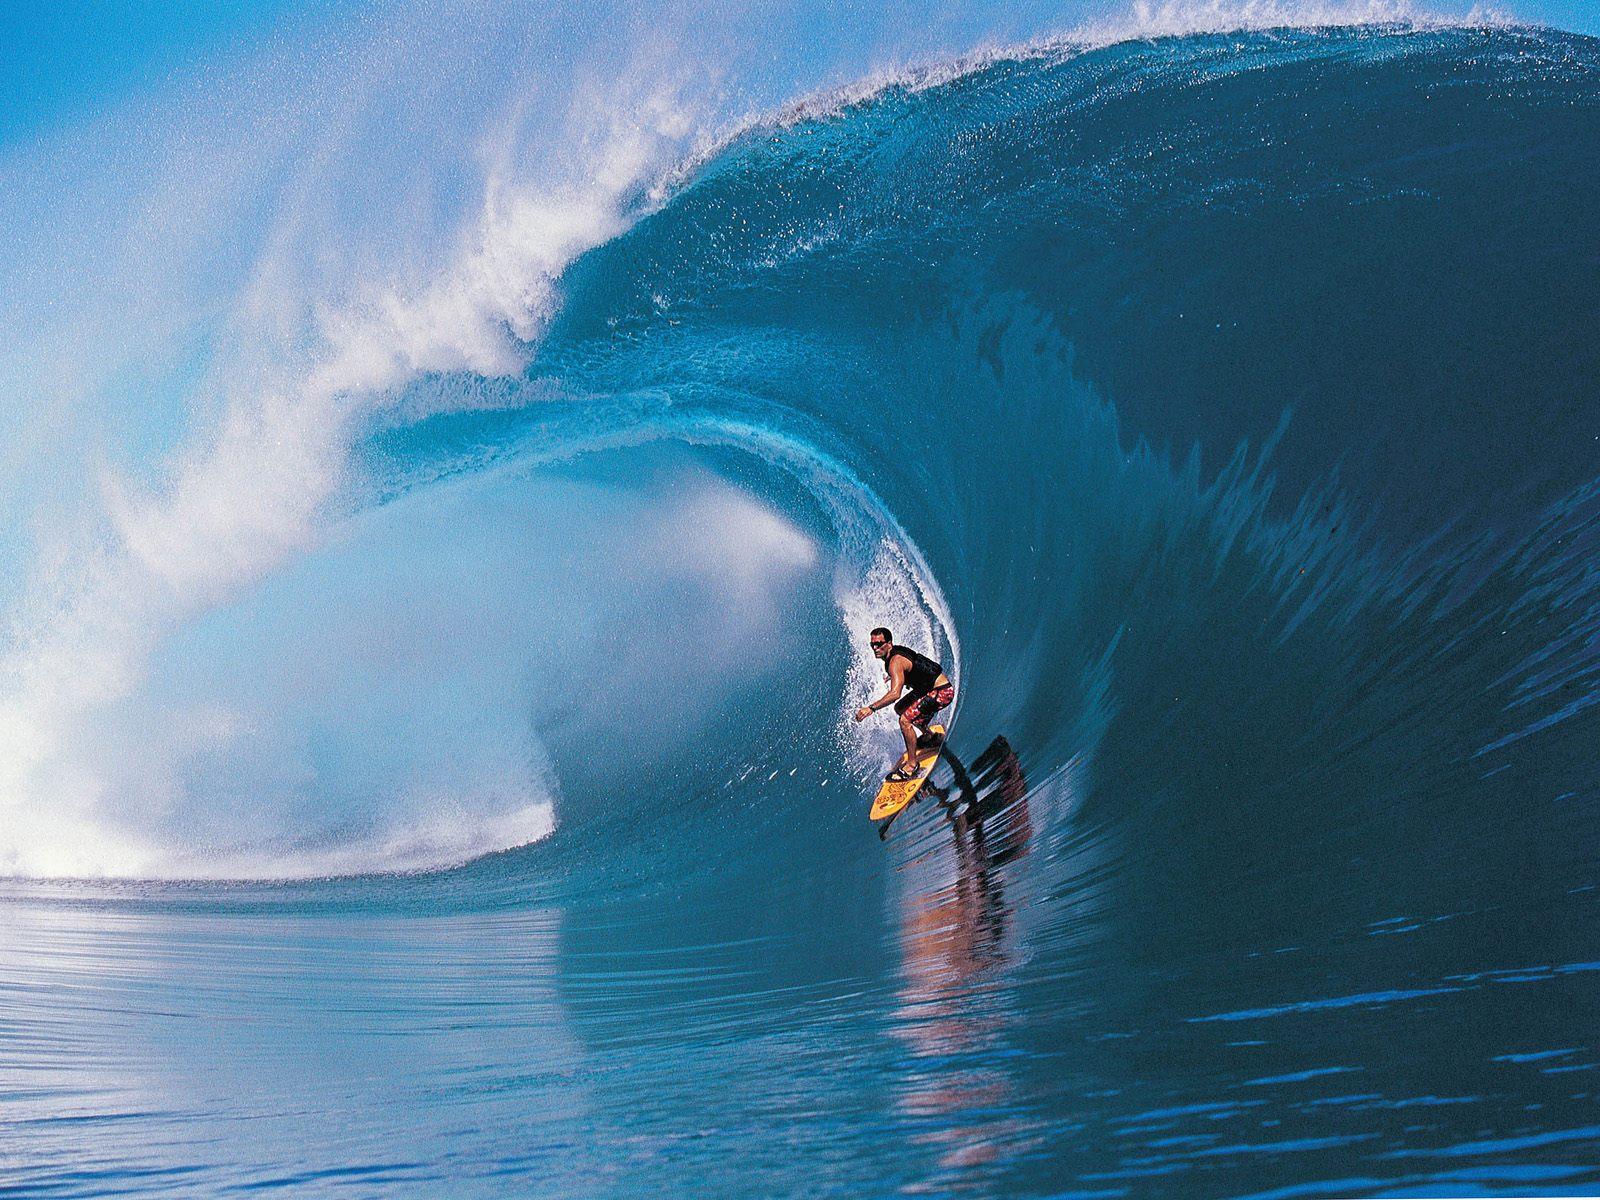 Desktop Wallpapers Sports Surfing Waves